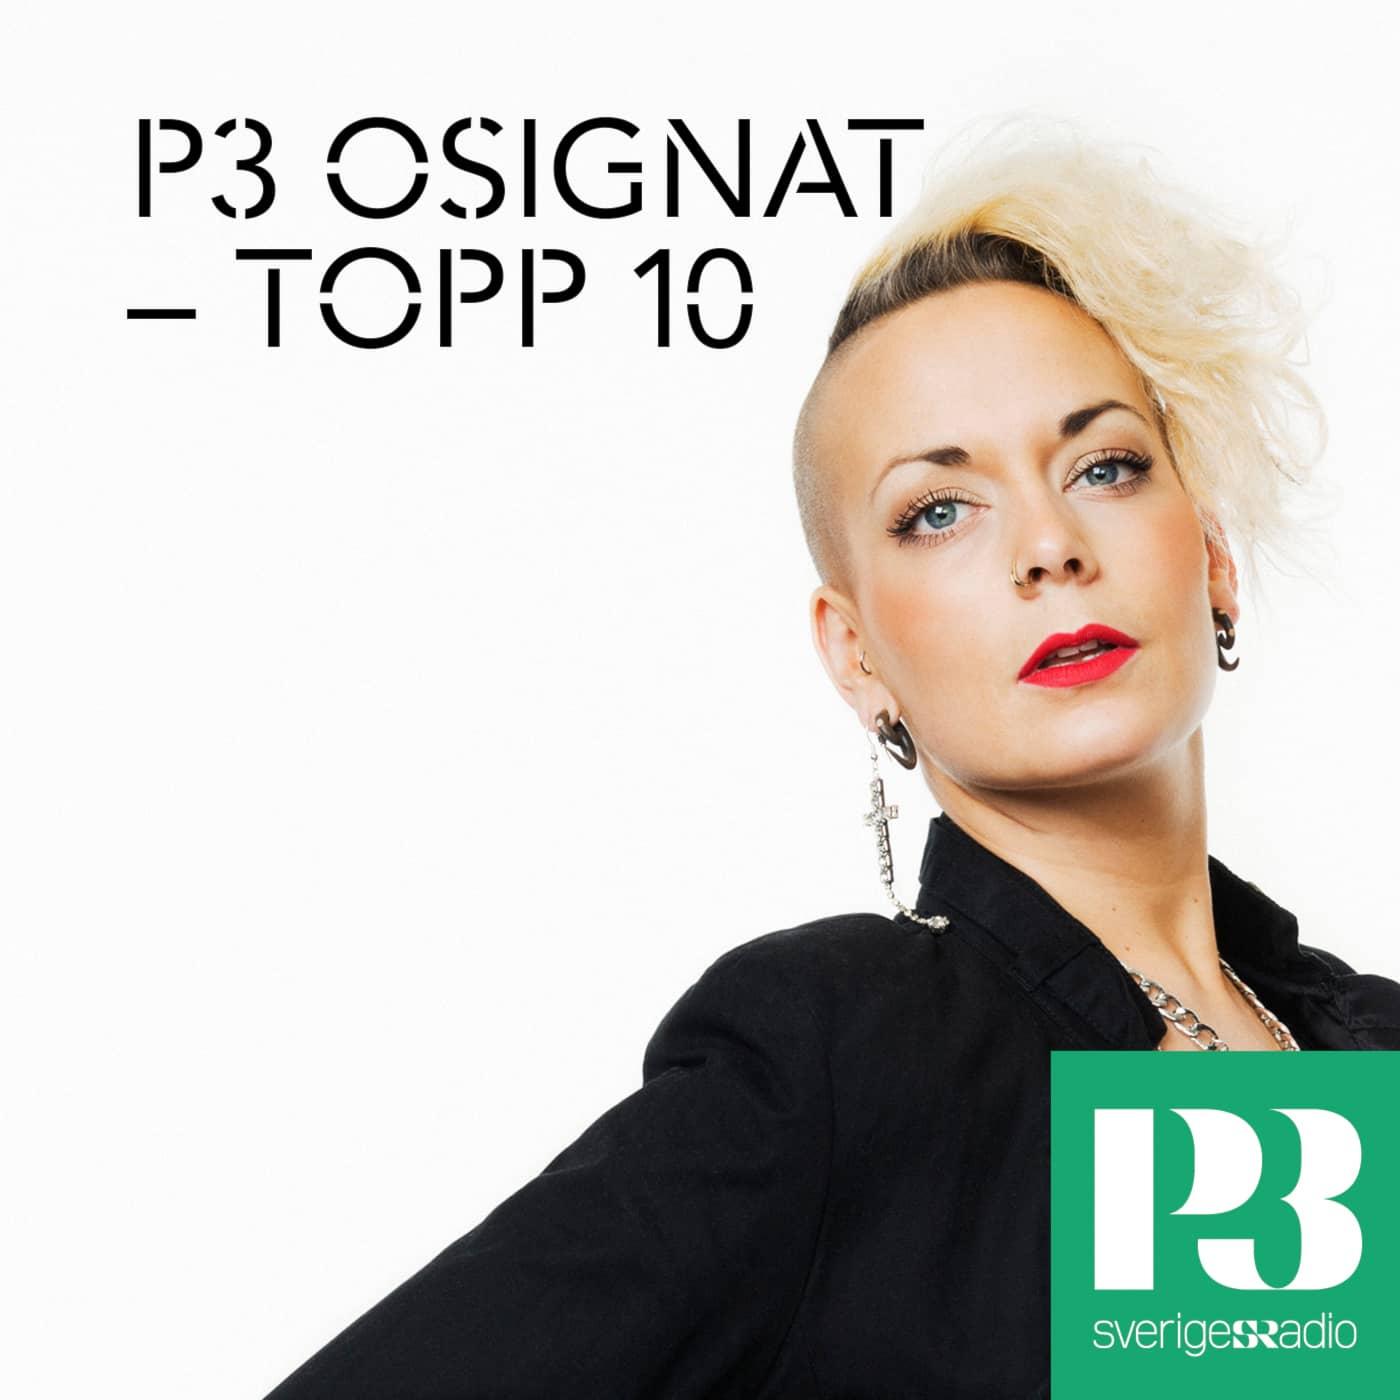 P3 Osignat - Topp 10